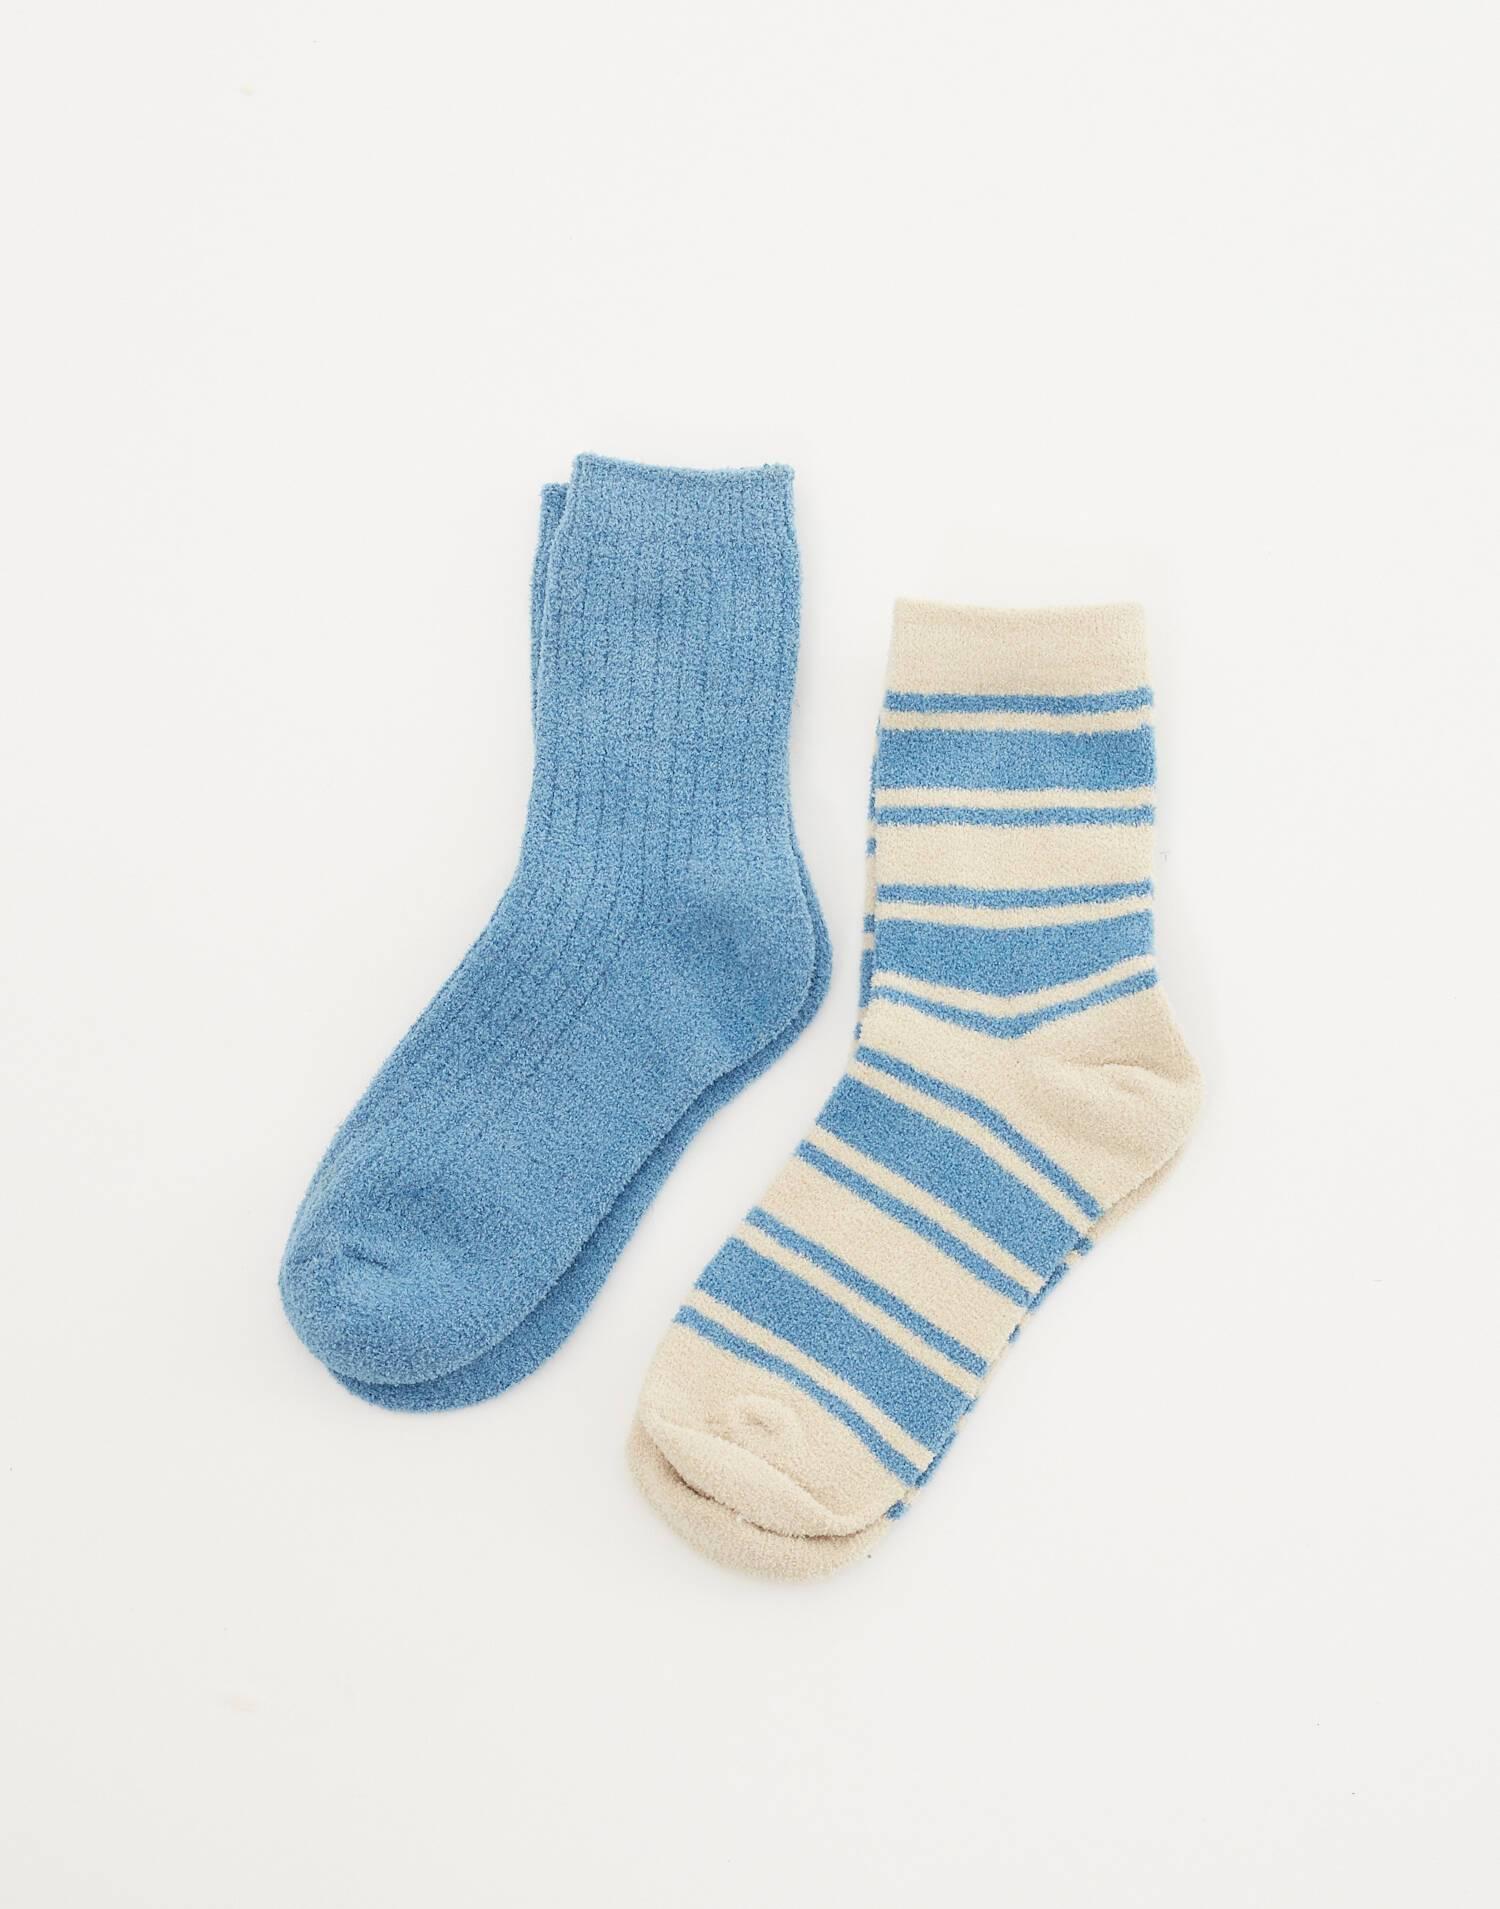 strippes and rib 2-pack socks